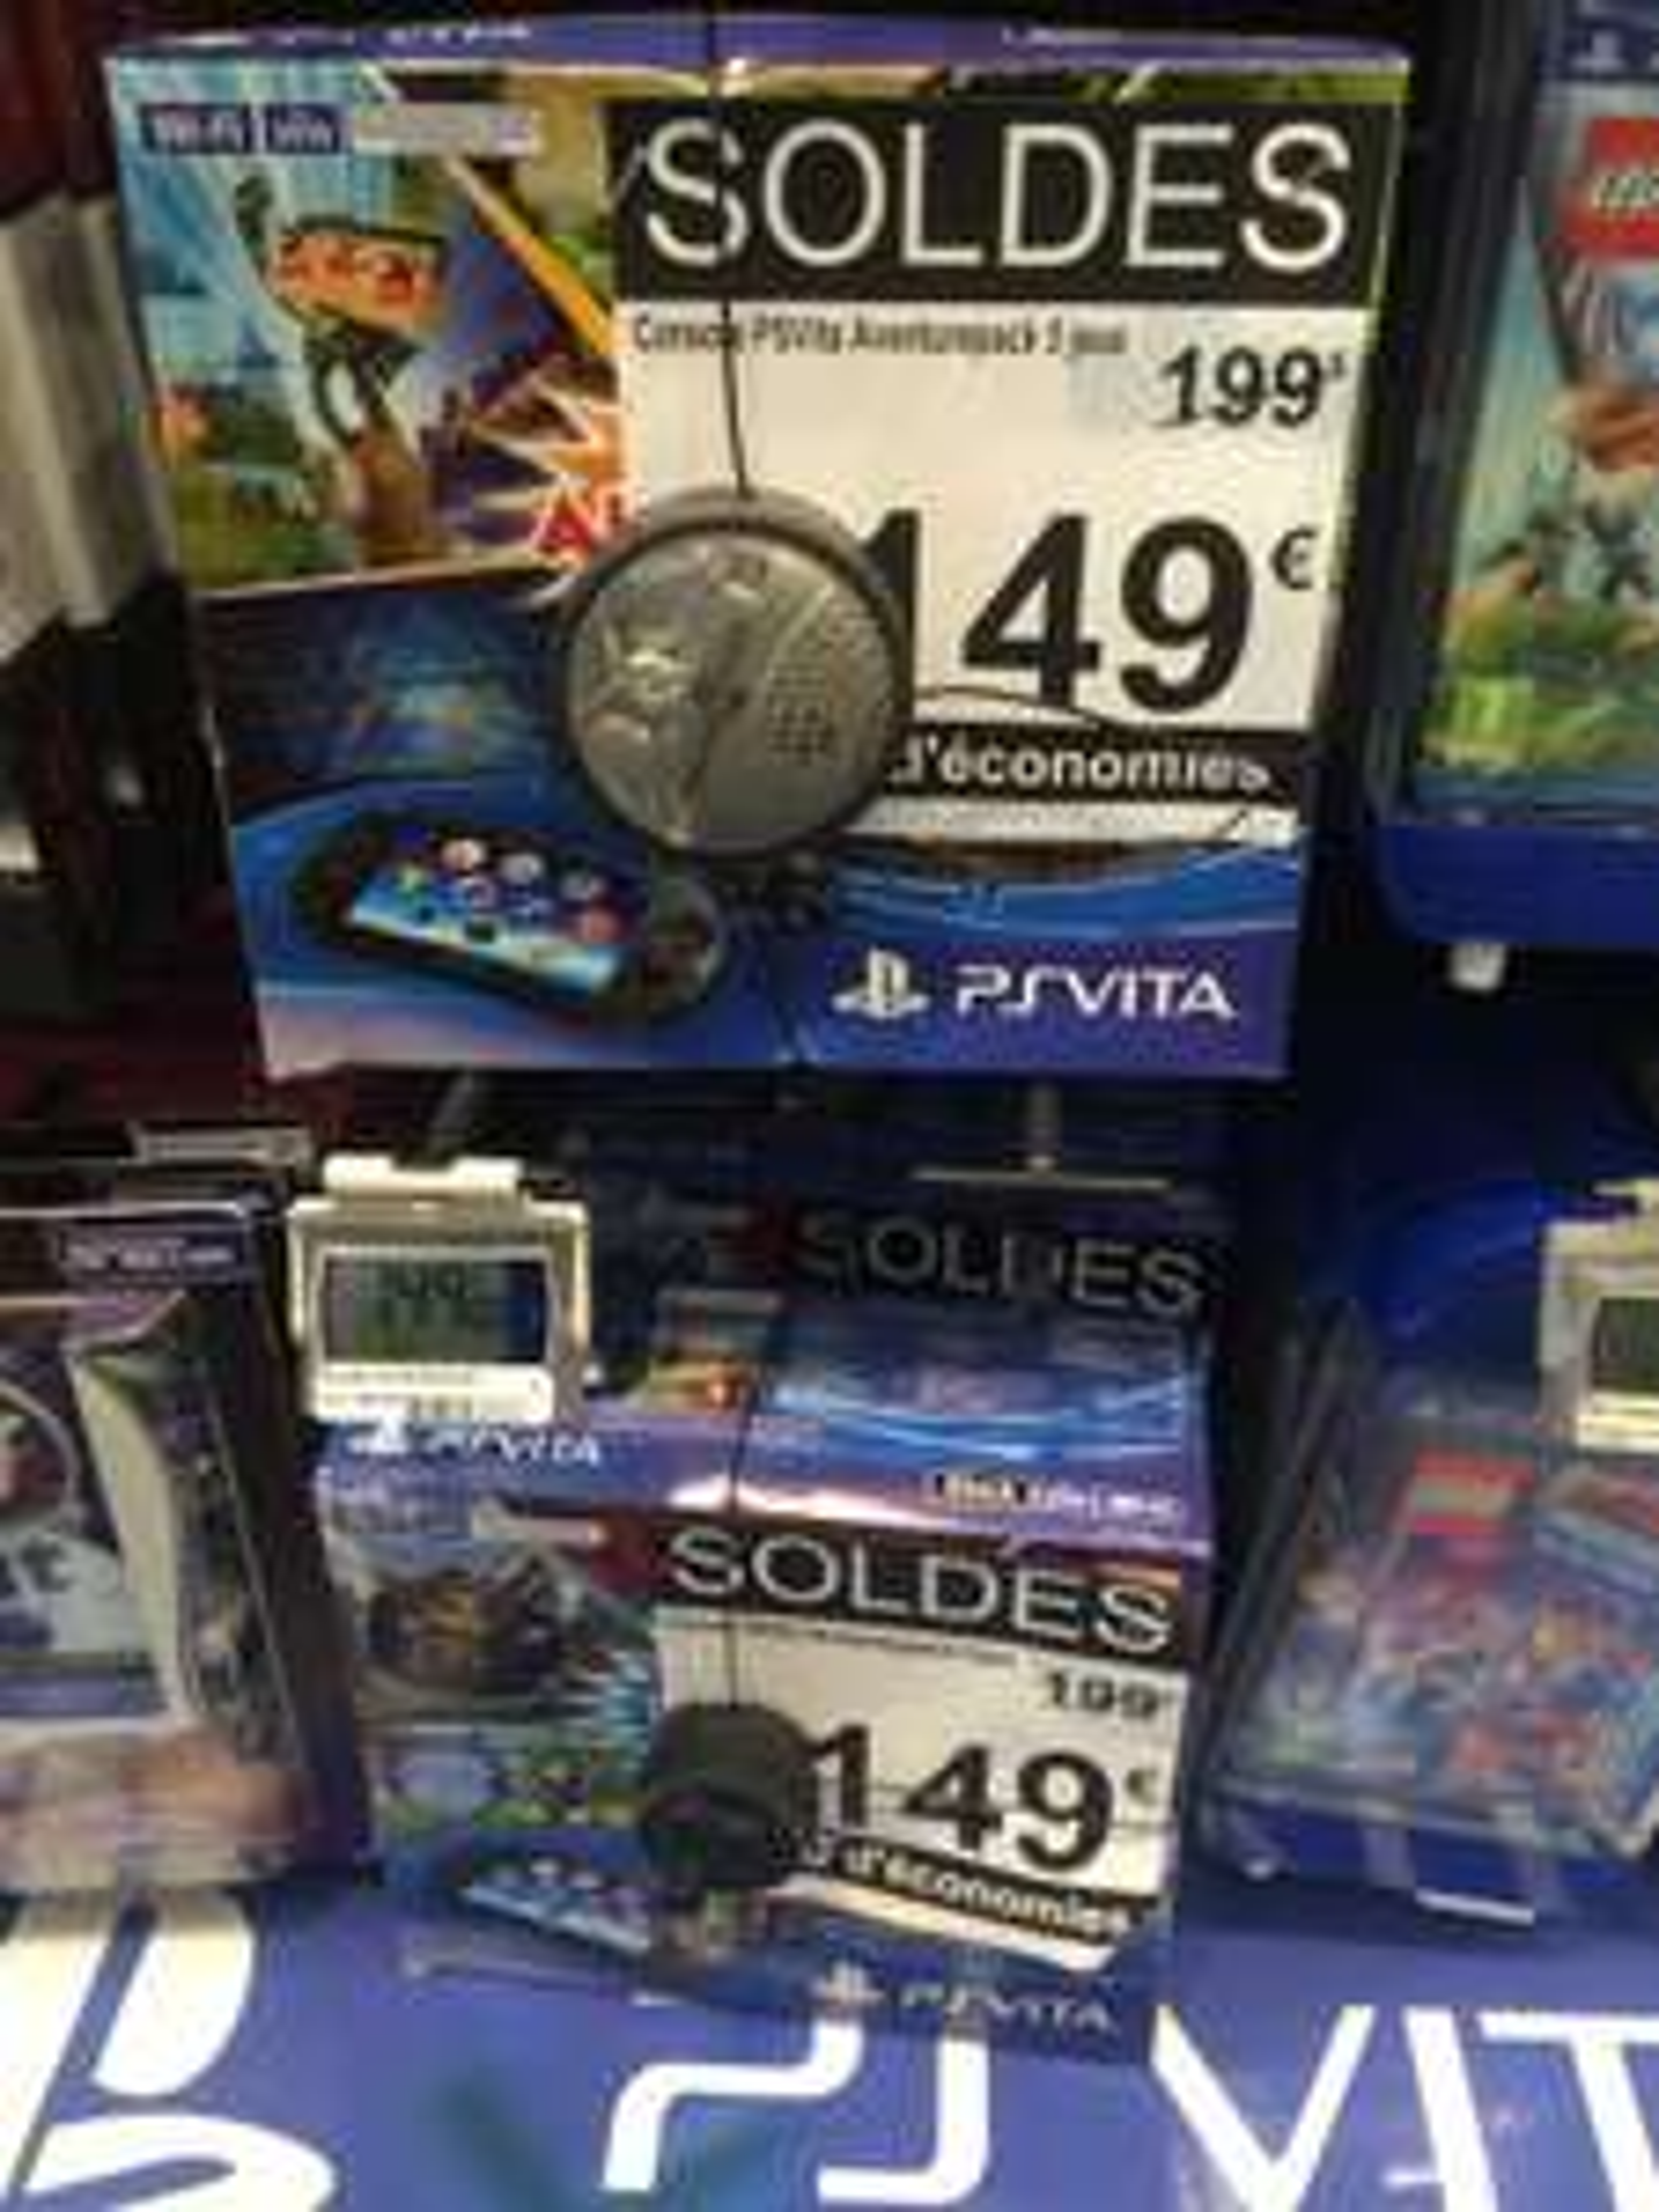 Console PS Vita Aventure Pack